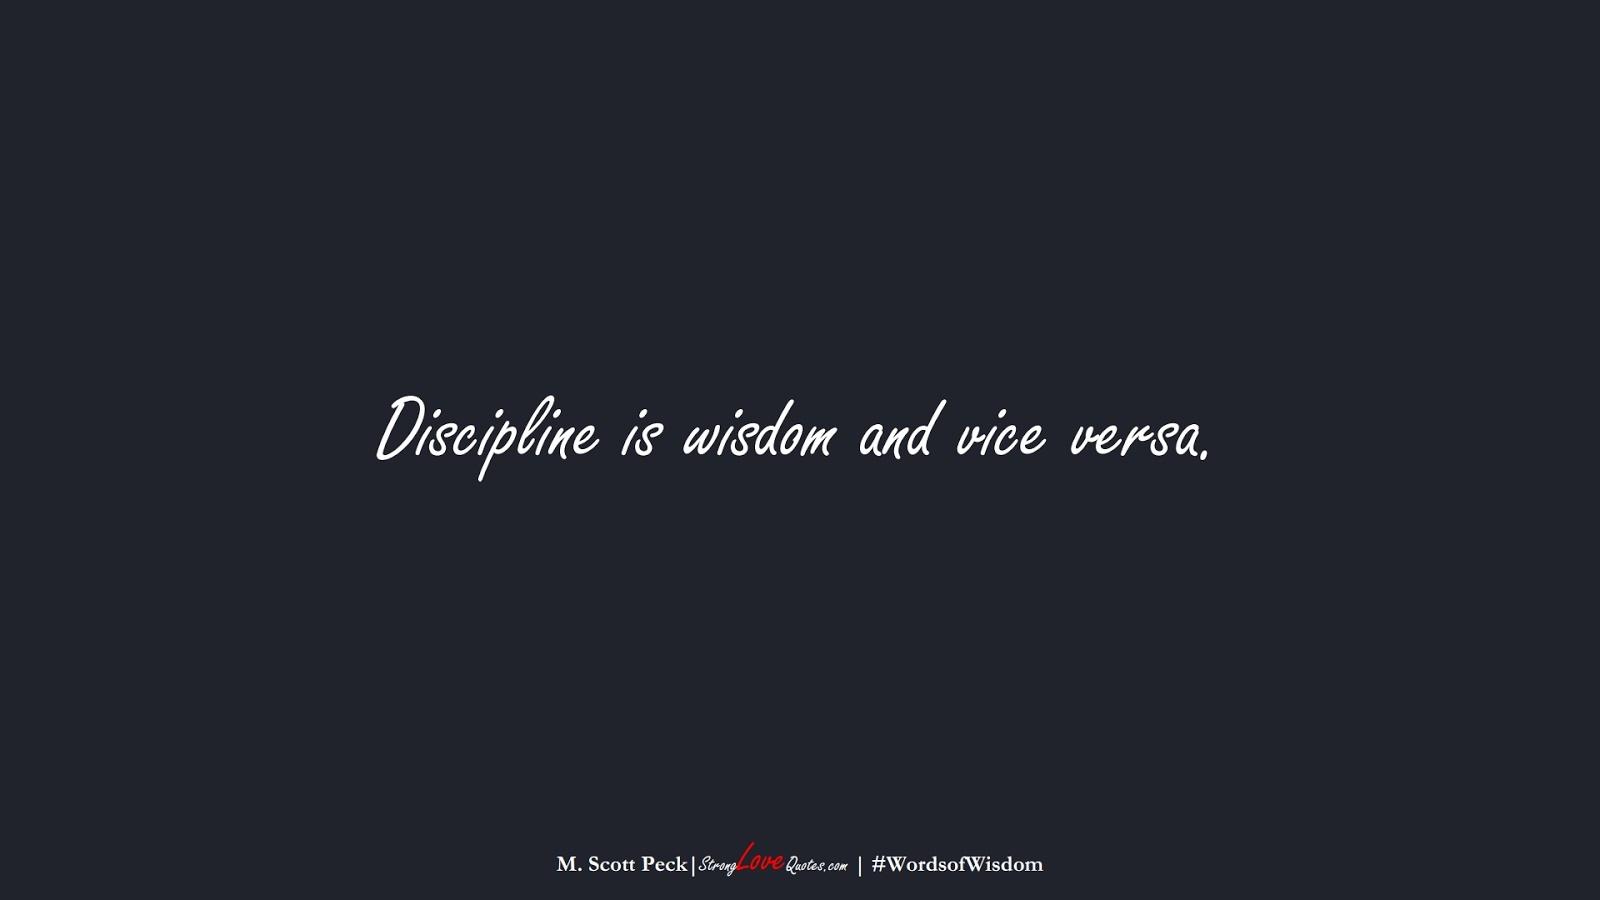 Discipline is wisdom and vice versa. (M. Scott Peck);  #WordsofWisdom